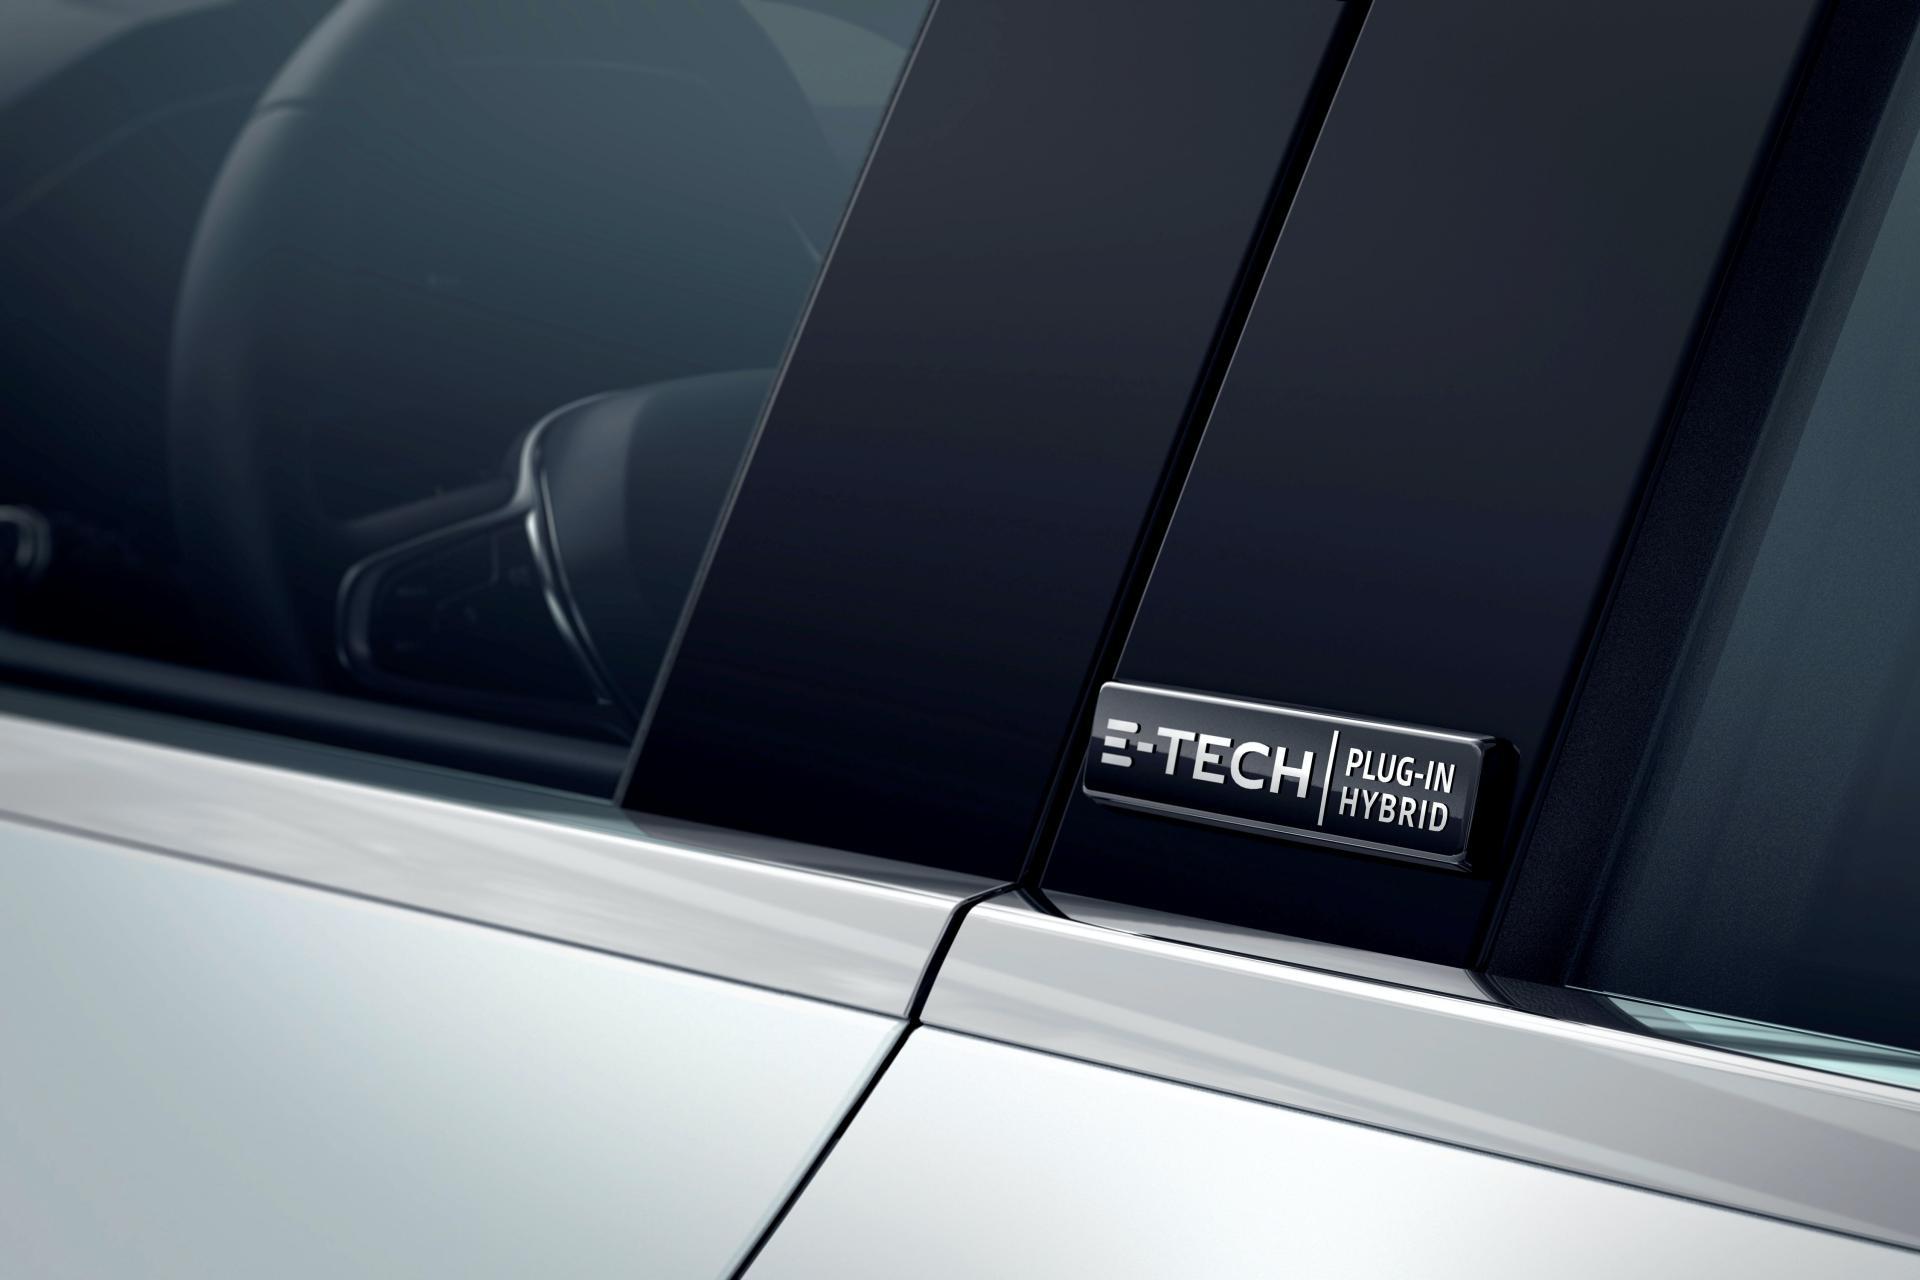 2020-Renault-Captur-E-Tech-plug-in-hybrid-7